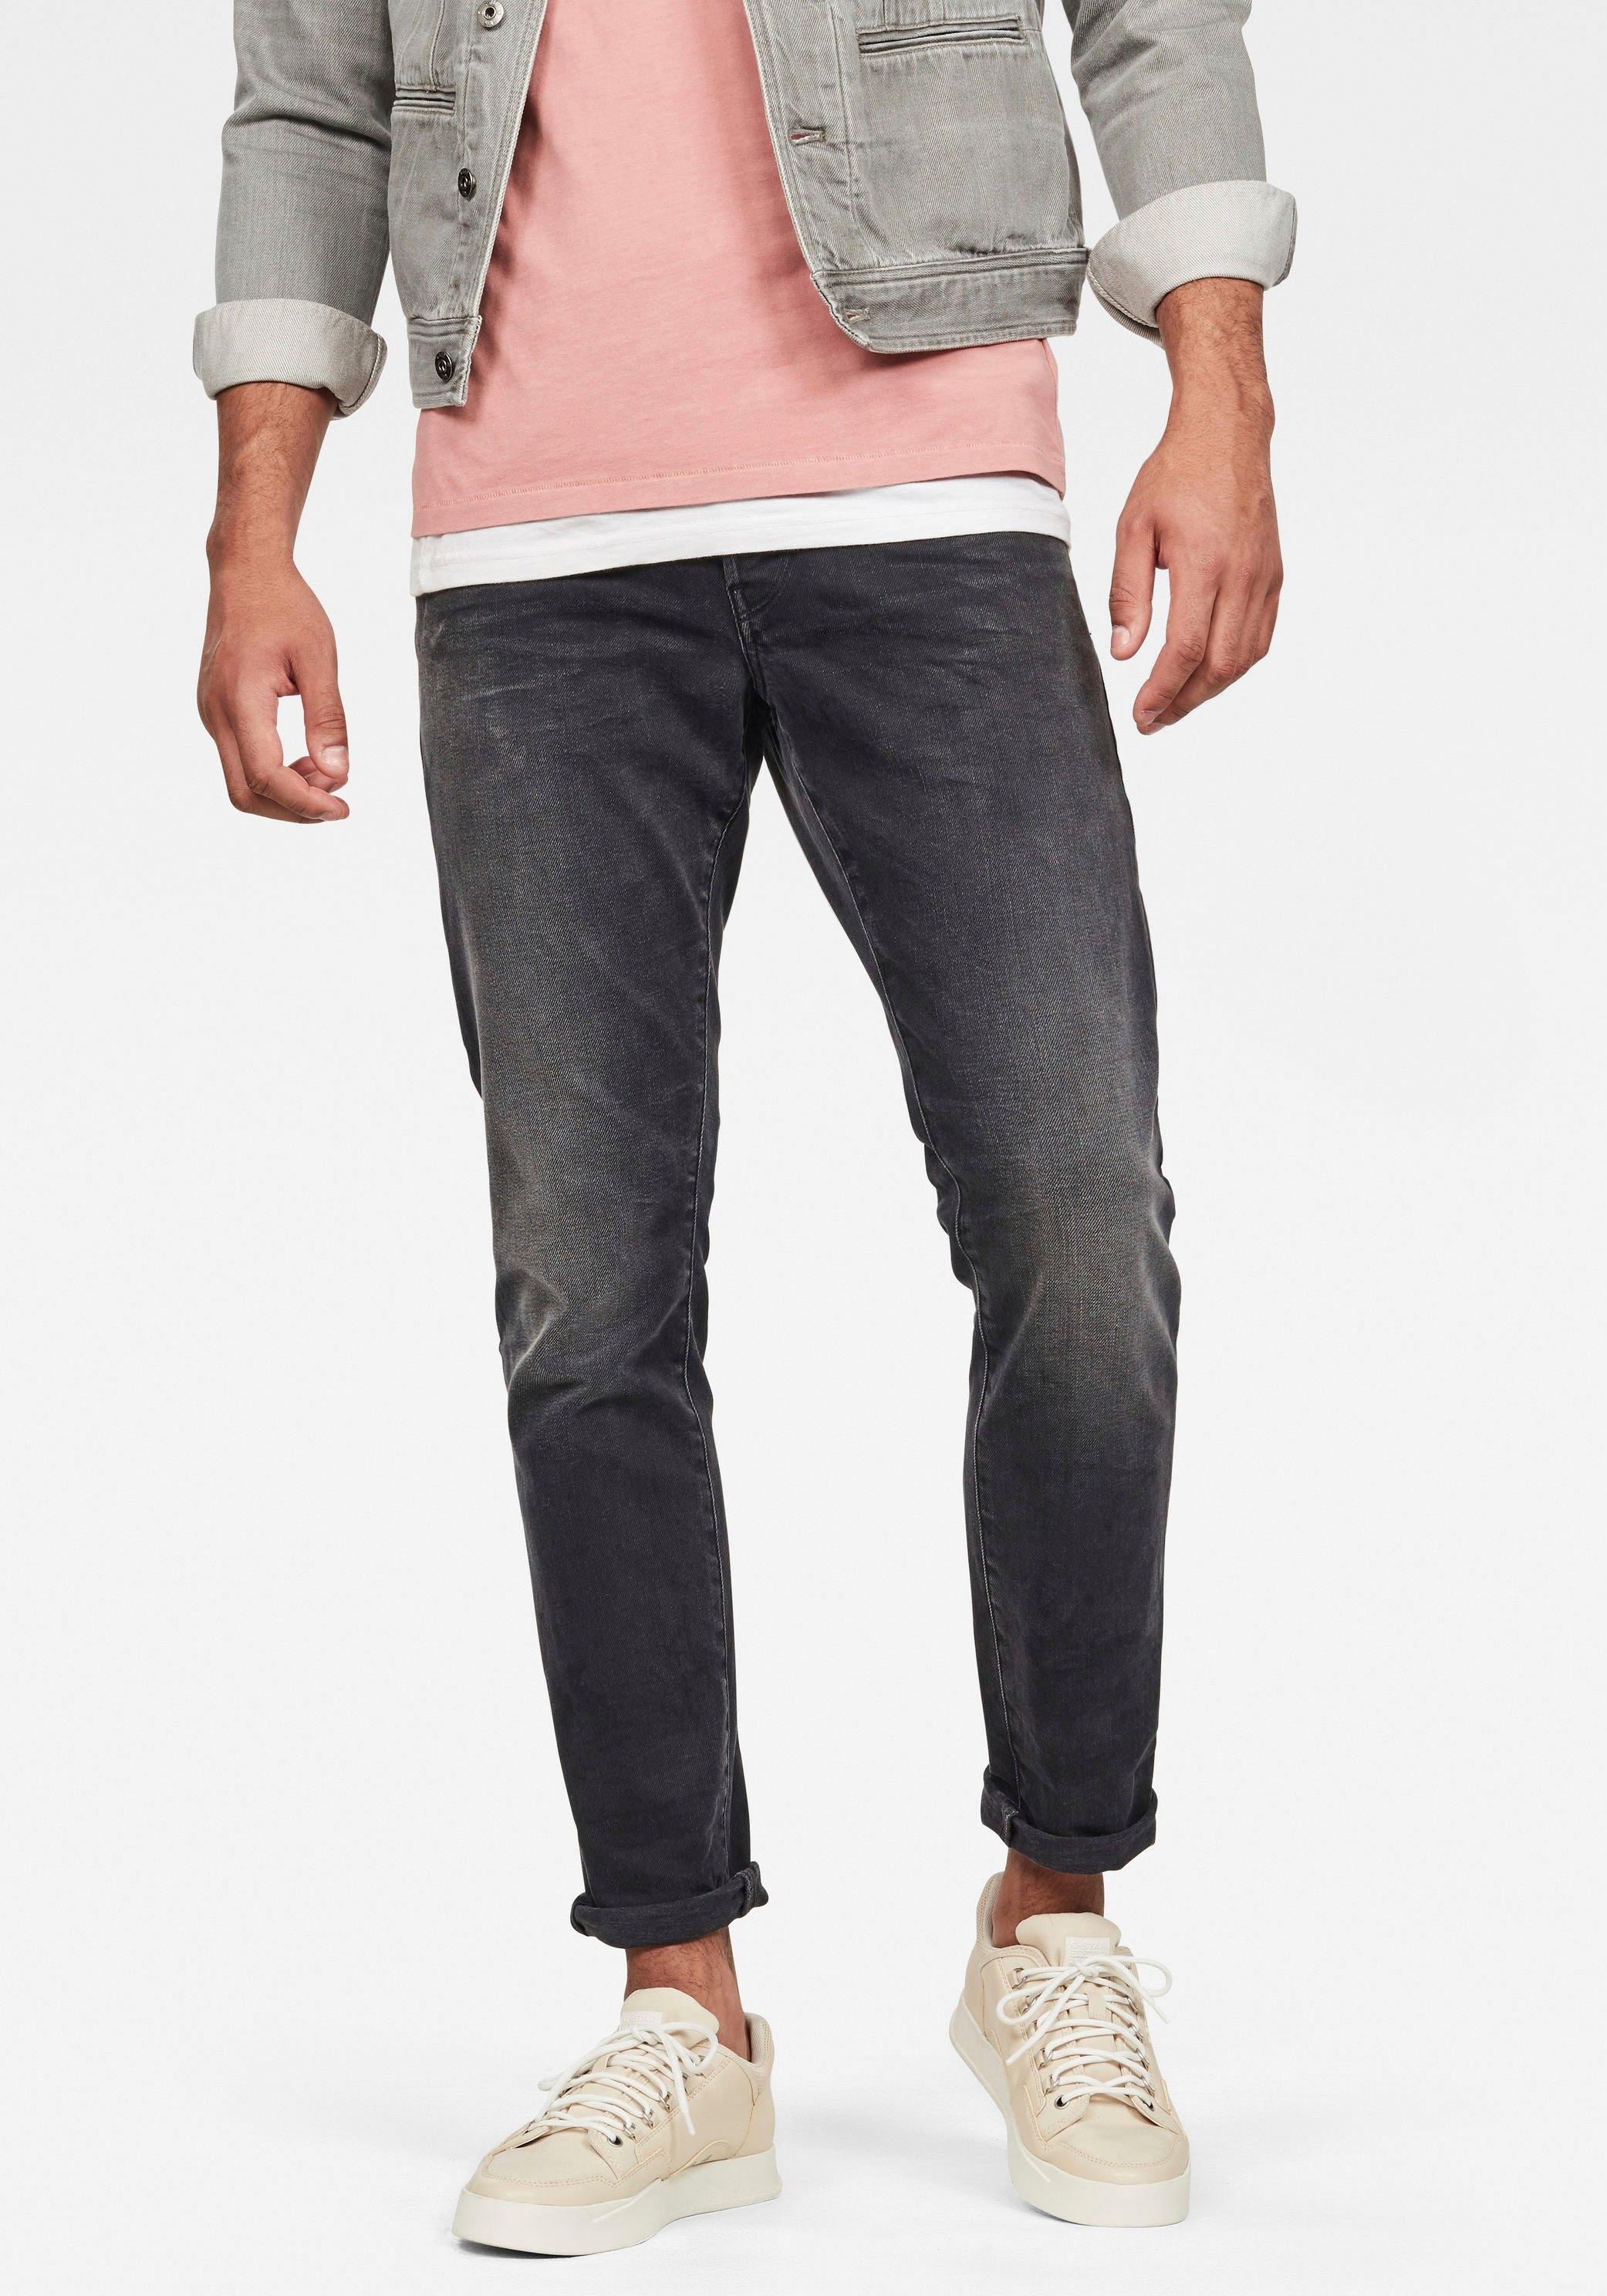 G-Star RAW regular fit jeans »3301 Straight Tapered« voordelig en veilig online kopen